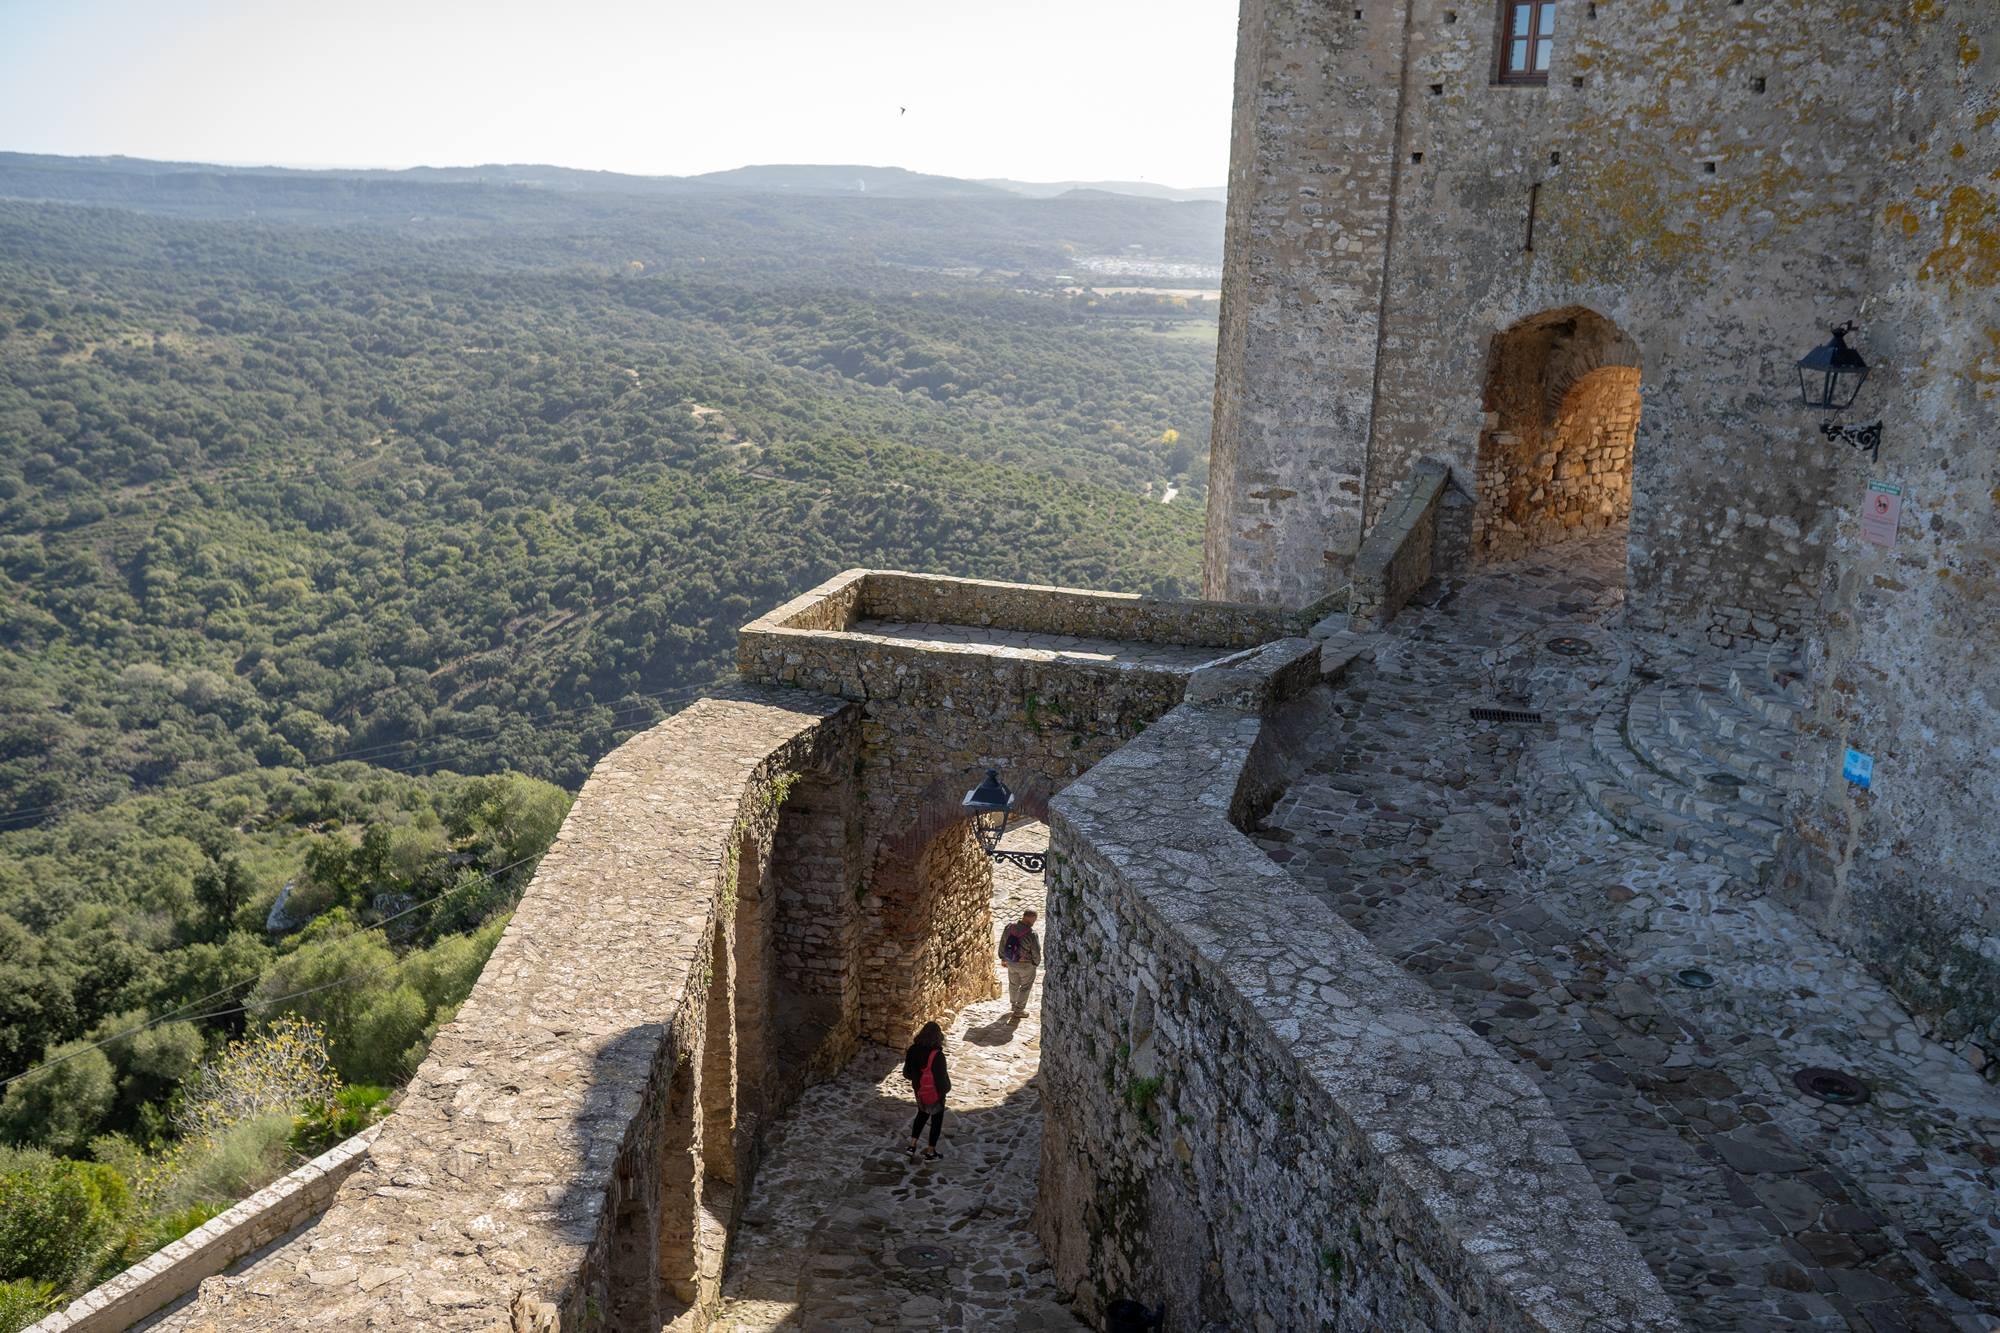 Visita a Castellar Viejo (Cádiz): ¿Qué saber antes de ir? | Guía ...